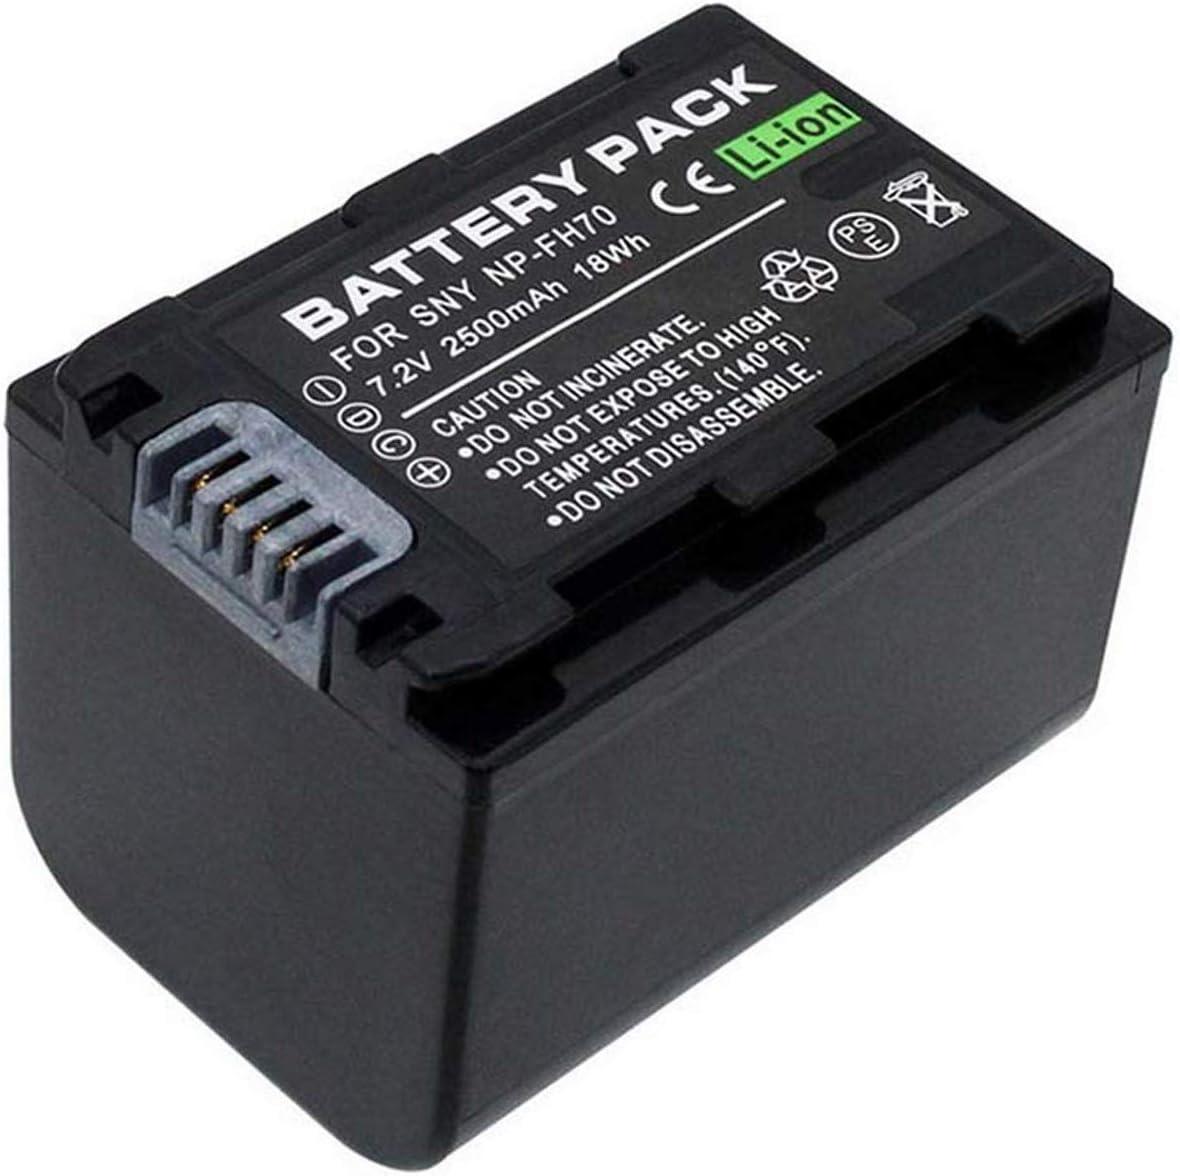 Battery Pack for Sony HDR-CX500VE HDR-CX520VE Handycam Camcorder HDR-CX505VE